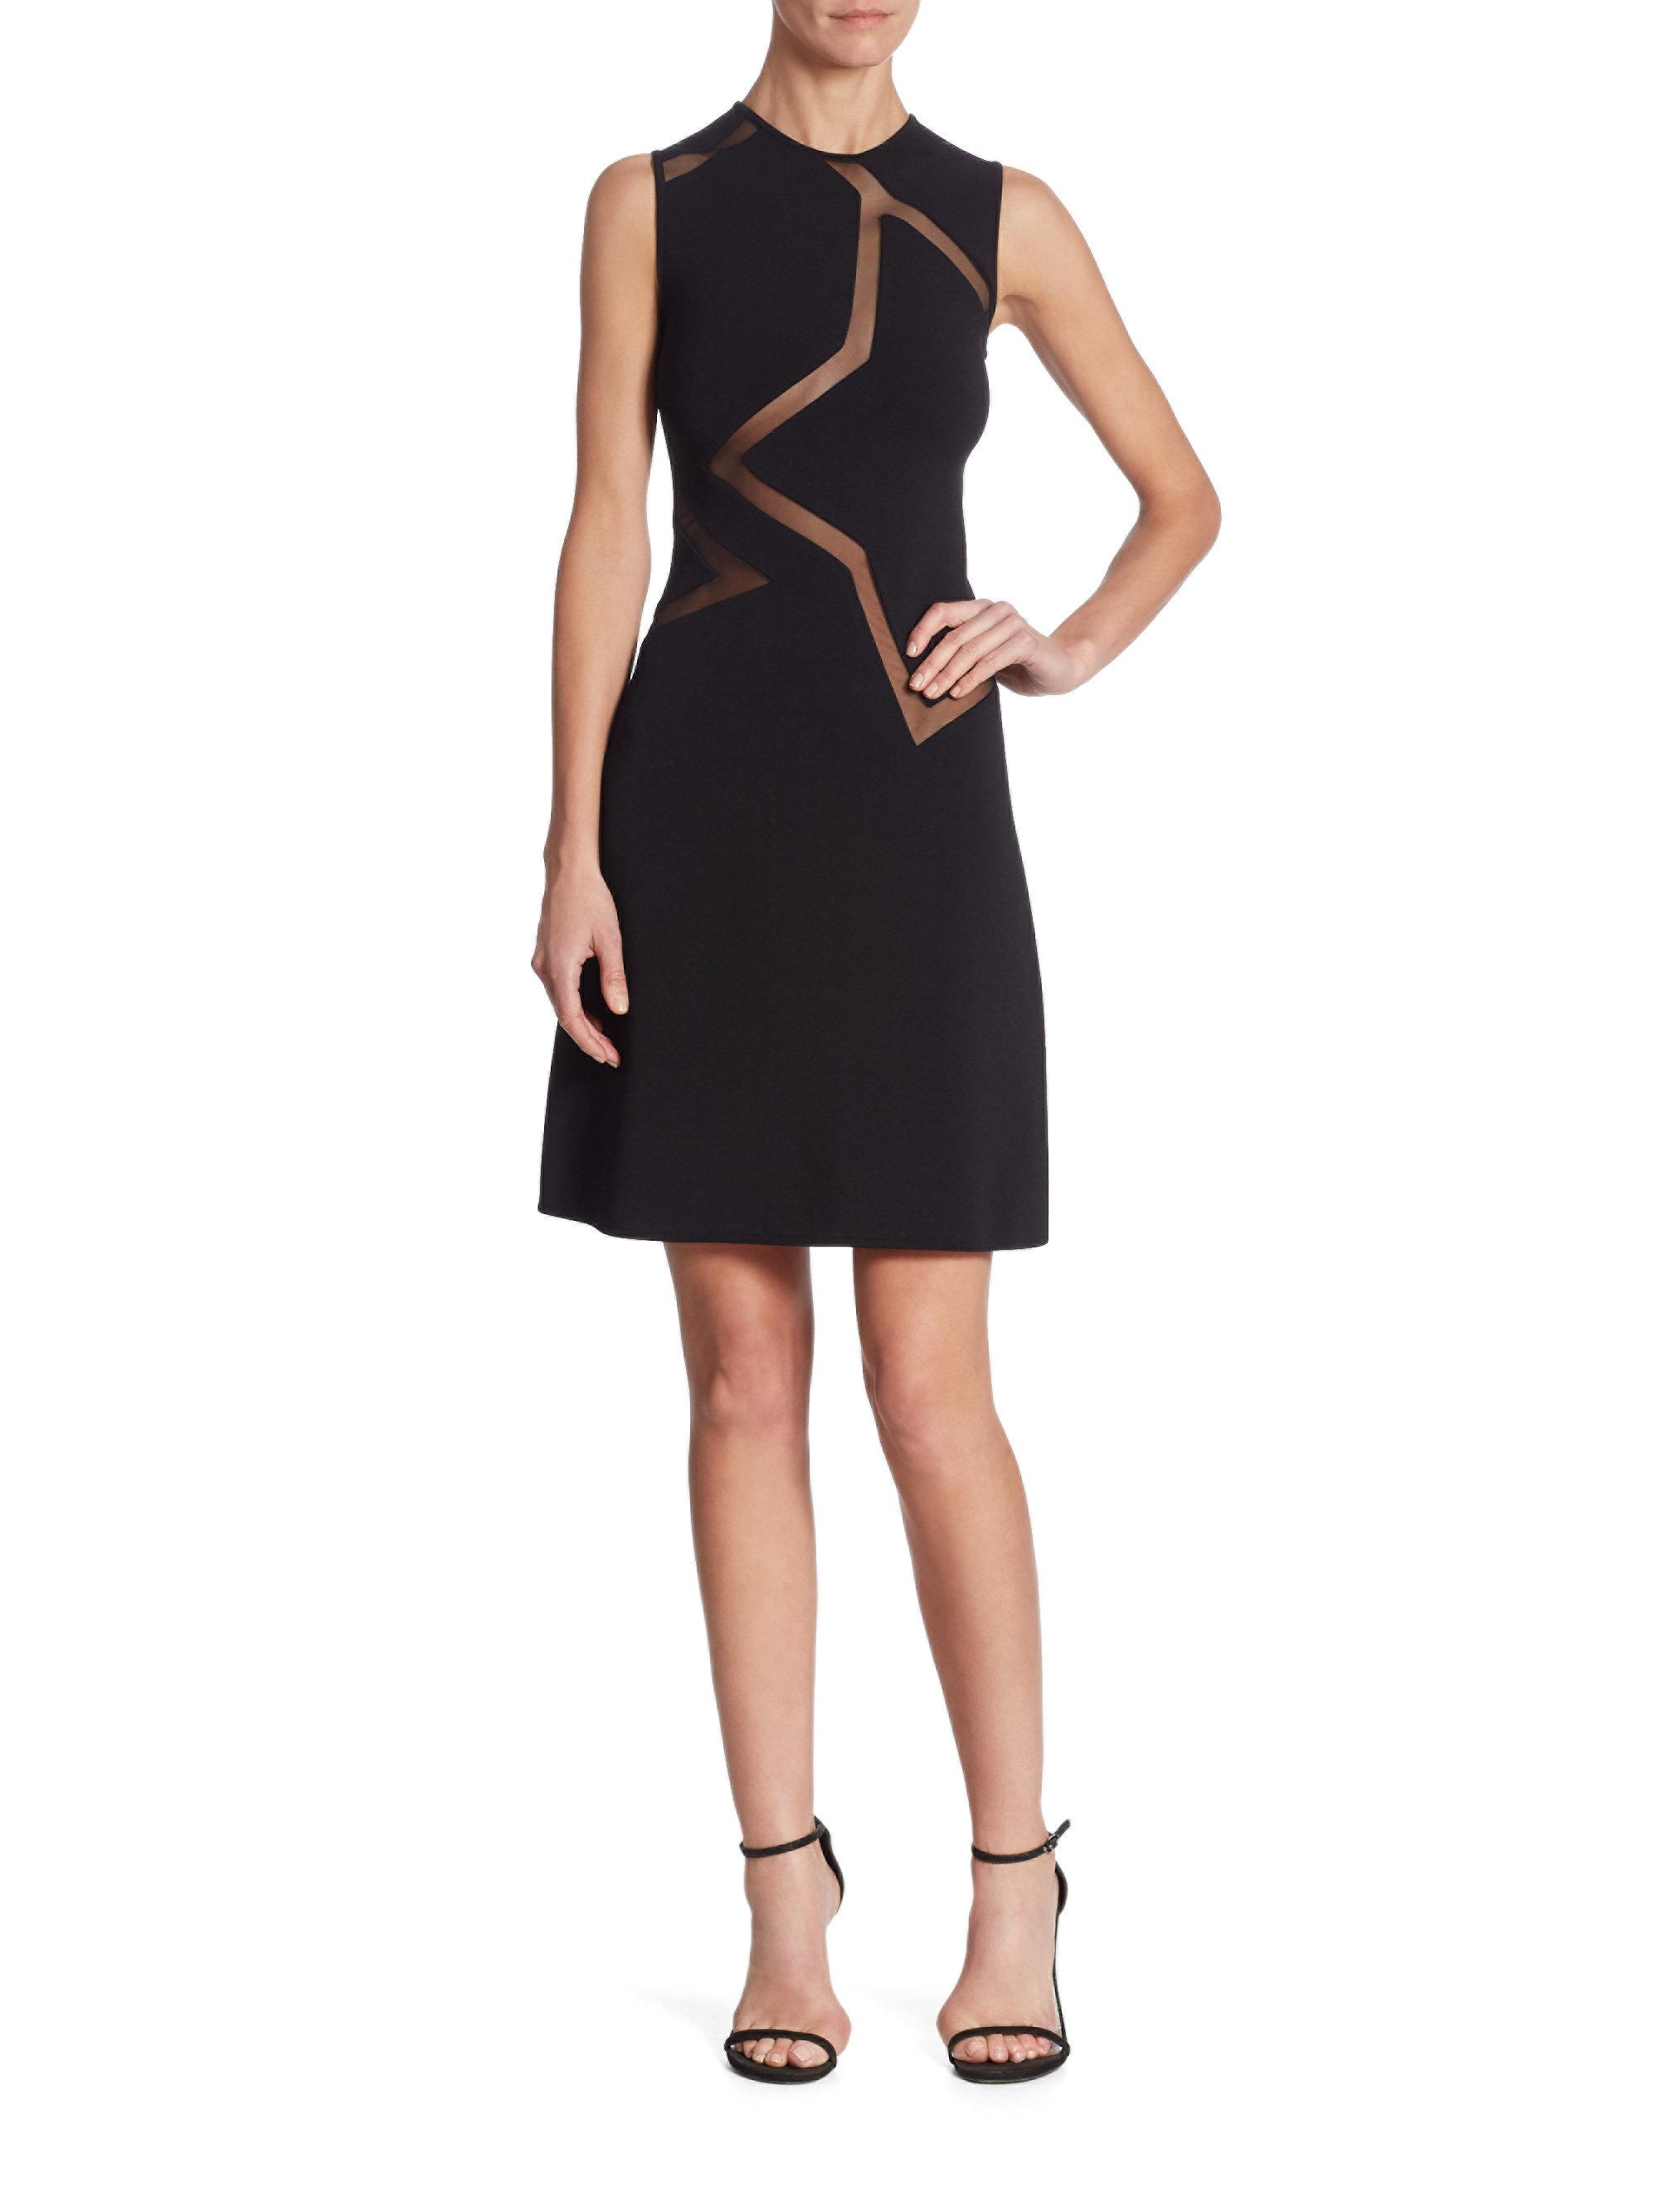 Lyst - Elie Saab Sleeveless Cocktail Dress in Black